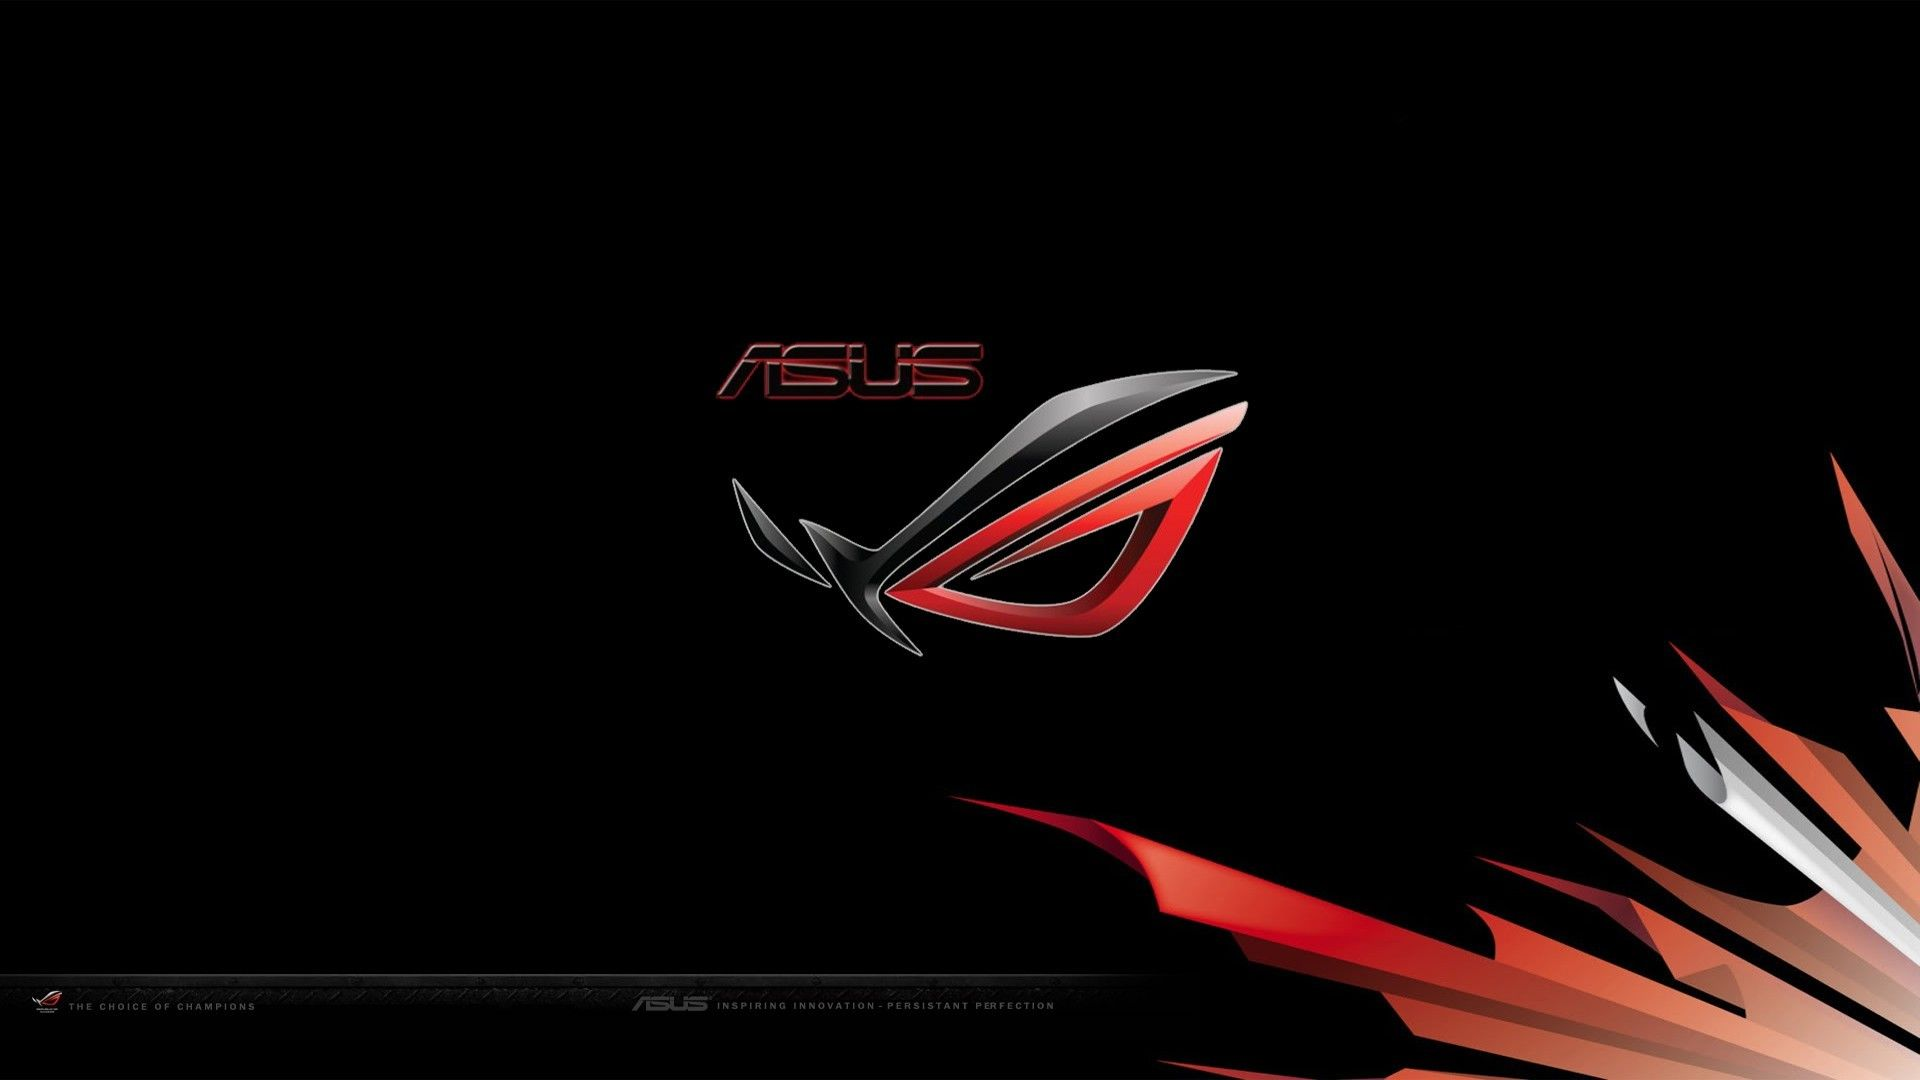 Asus ROG 4K Ultra HD Wallpapers - Top Free Asus ROG 4K ...